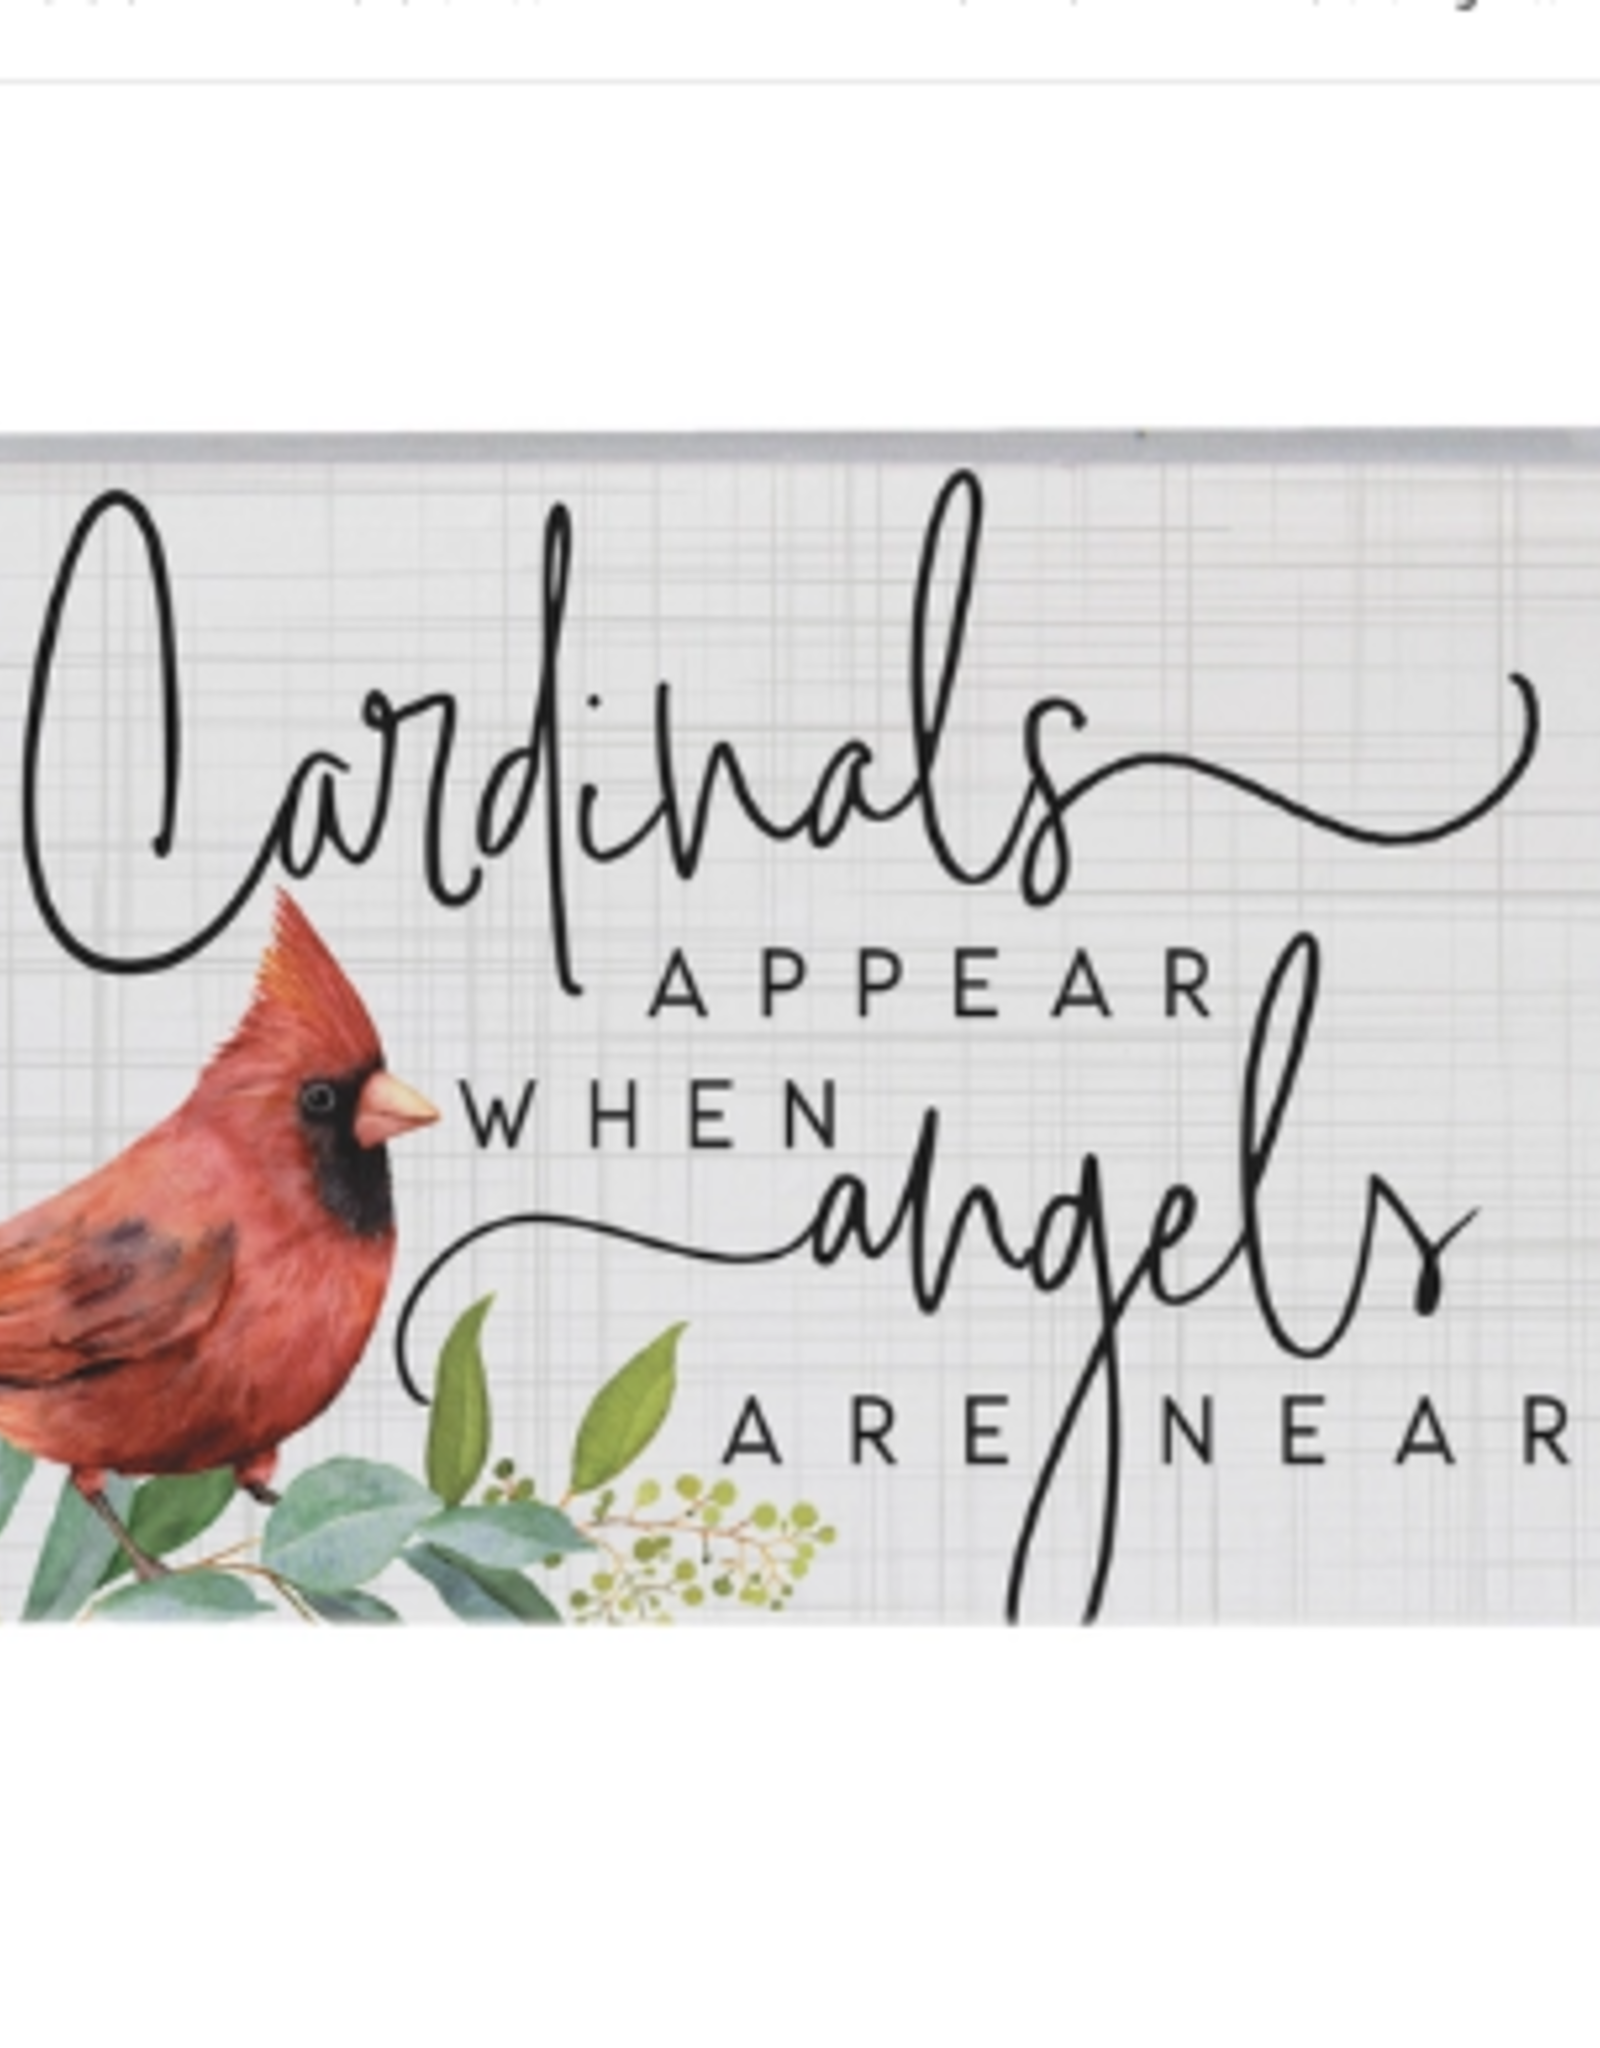 Sincere Surroundings Block Sign, Cardinals Appear